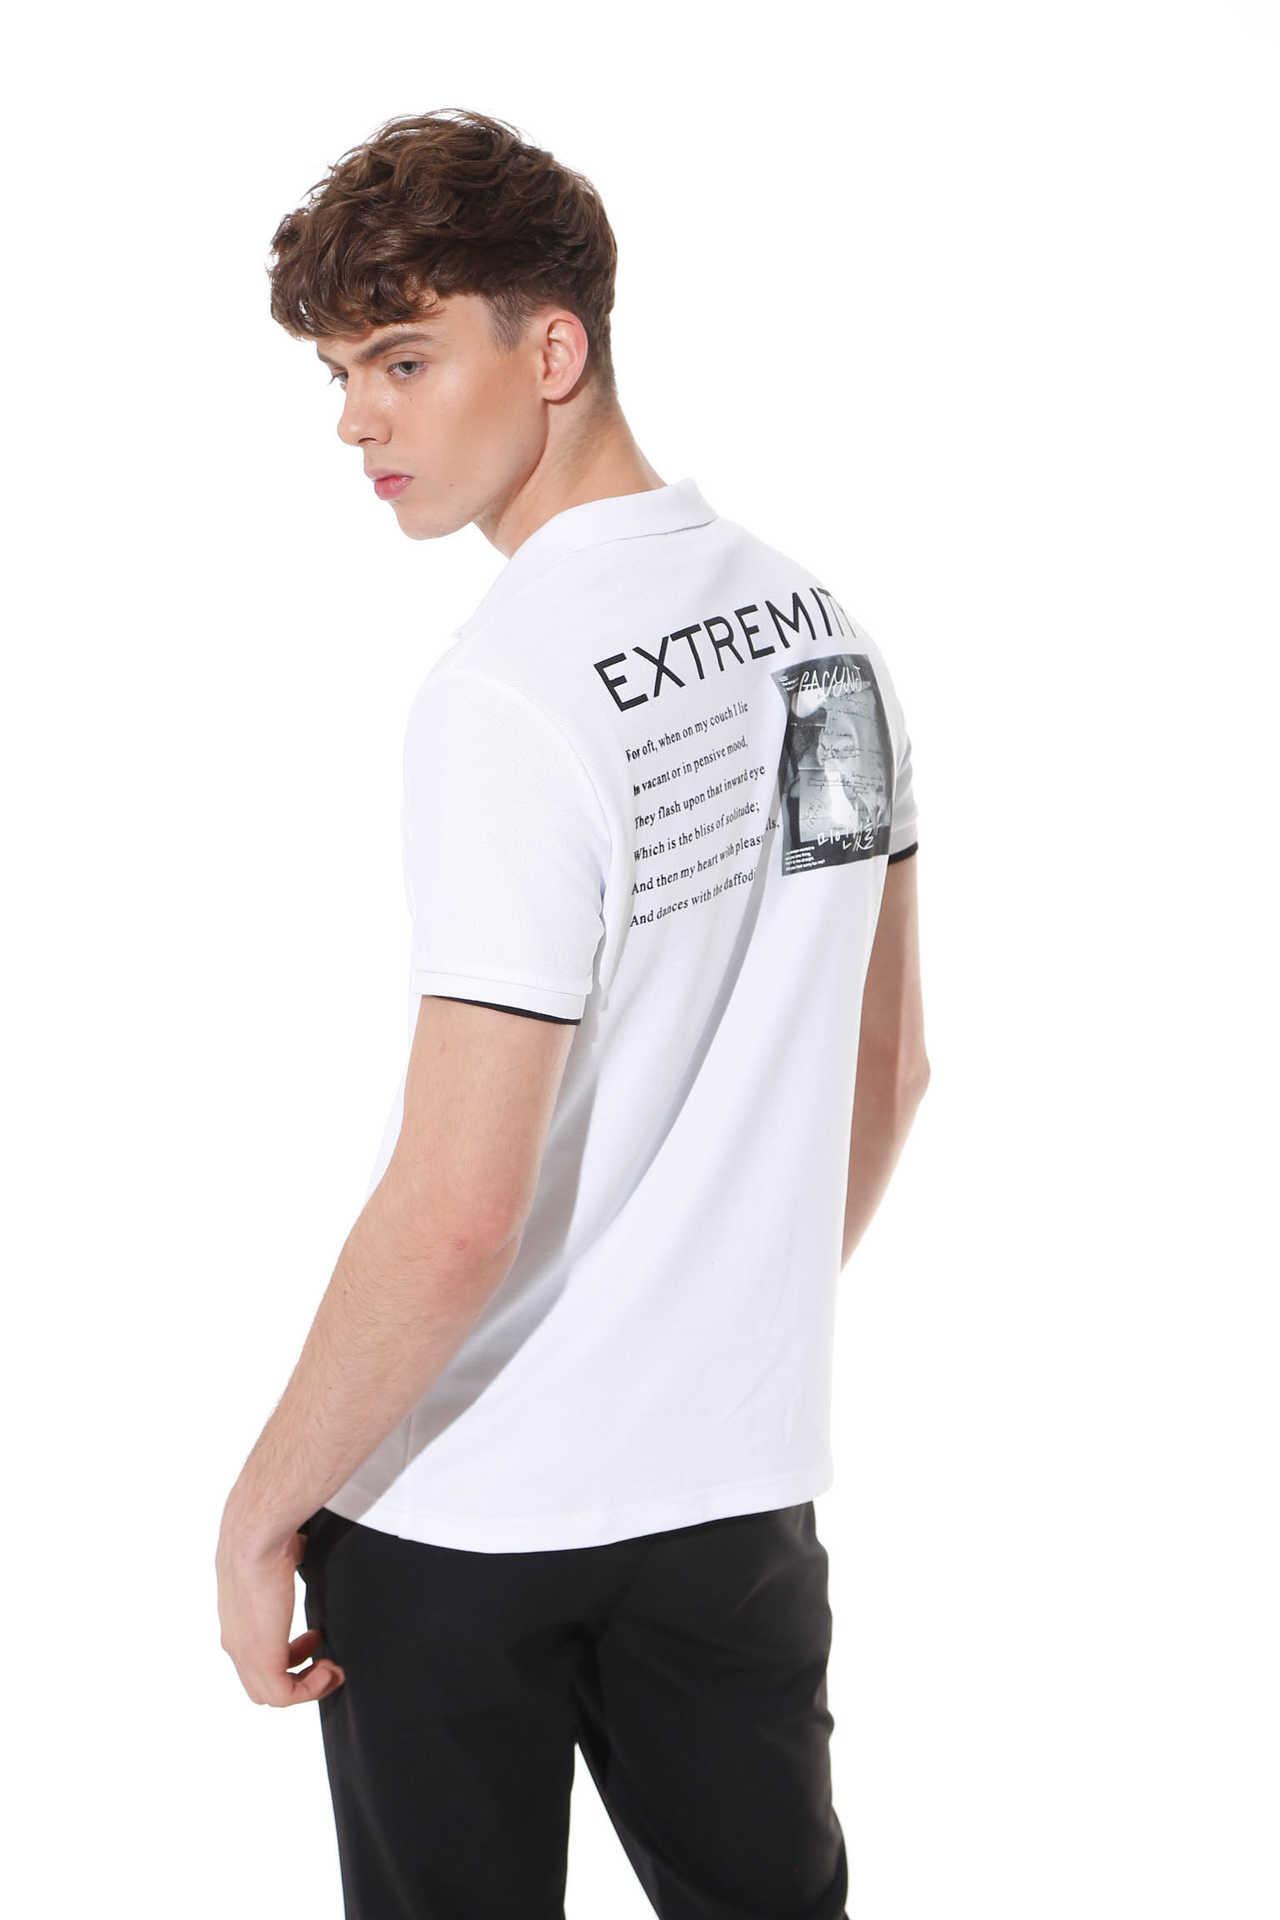 ZENL风尚男装领型有哪些 佐纳利风尚男装品牌展现男生时尚气息